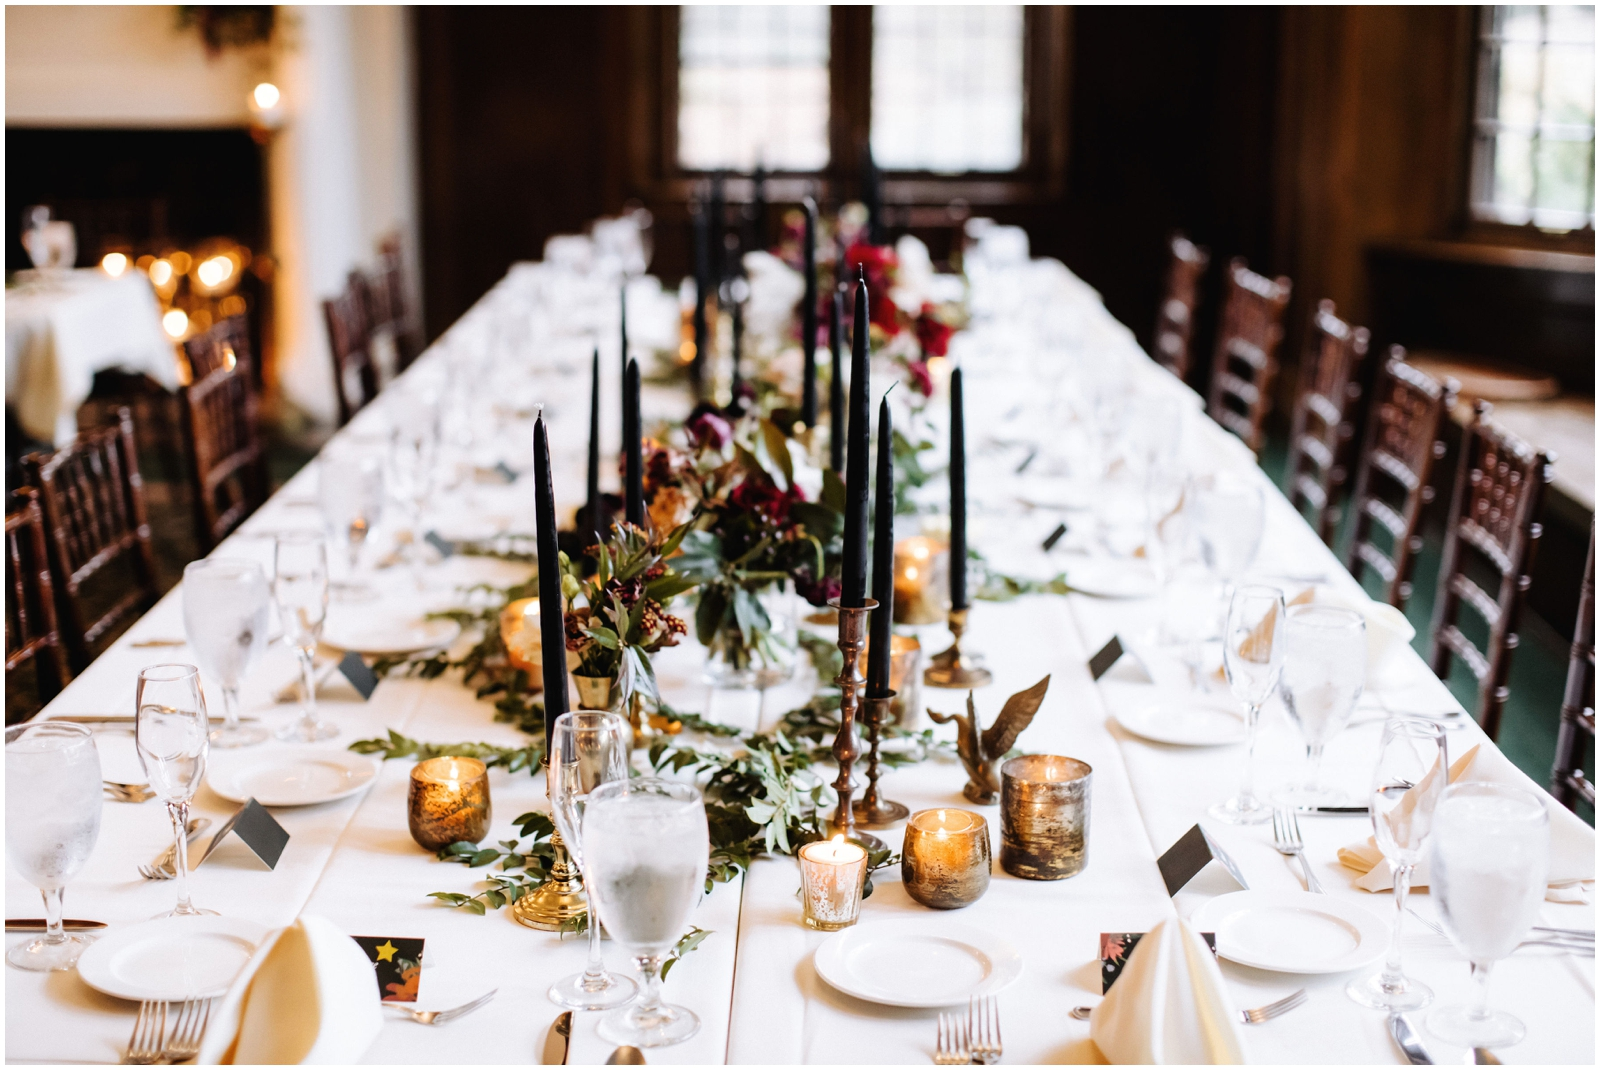 Minnesota Wedding Planner, Mpls Wedding Planner, Machine Shop MPLS, Mpls Wedding Venue. Wedding Reception Details. Centerpiece details